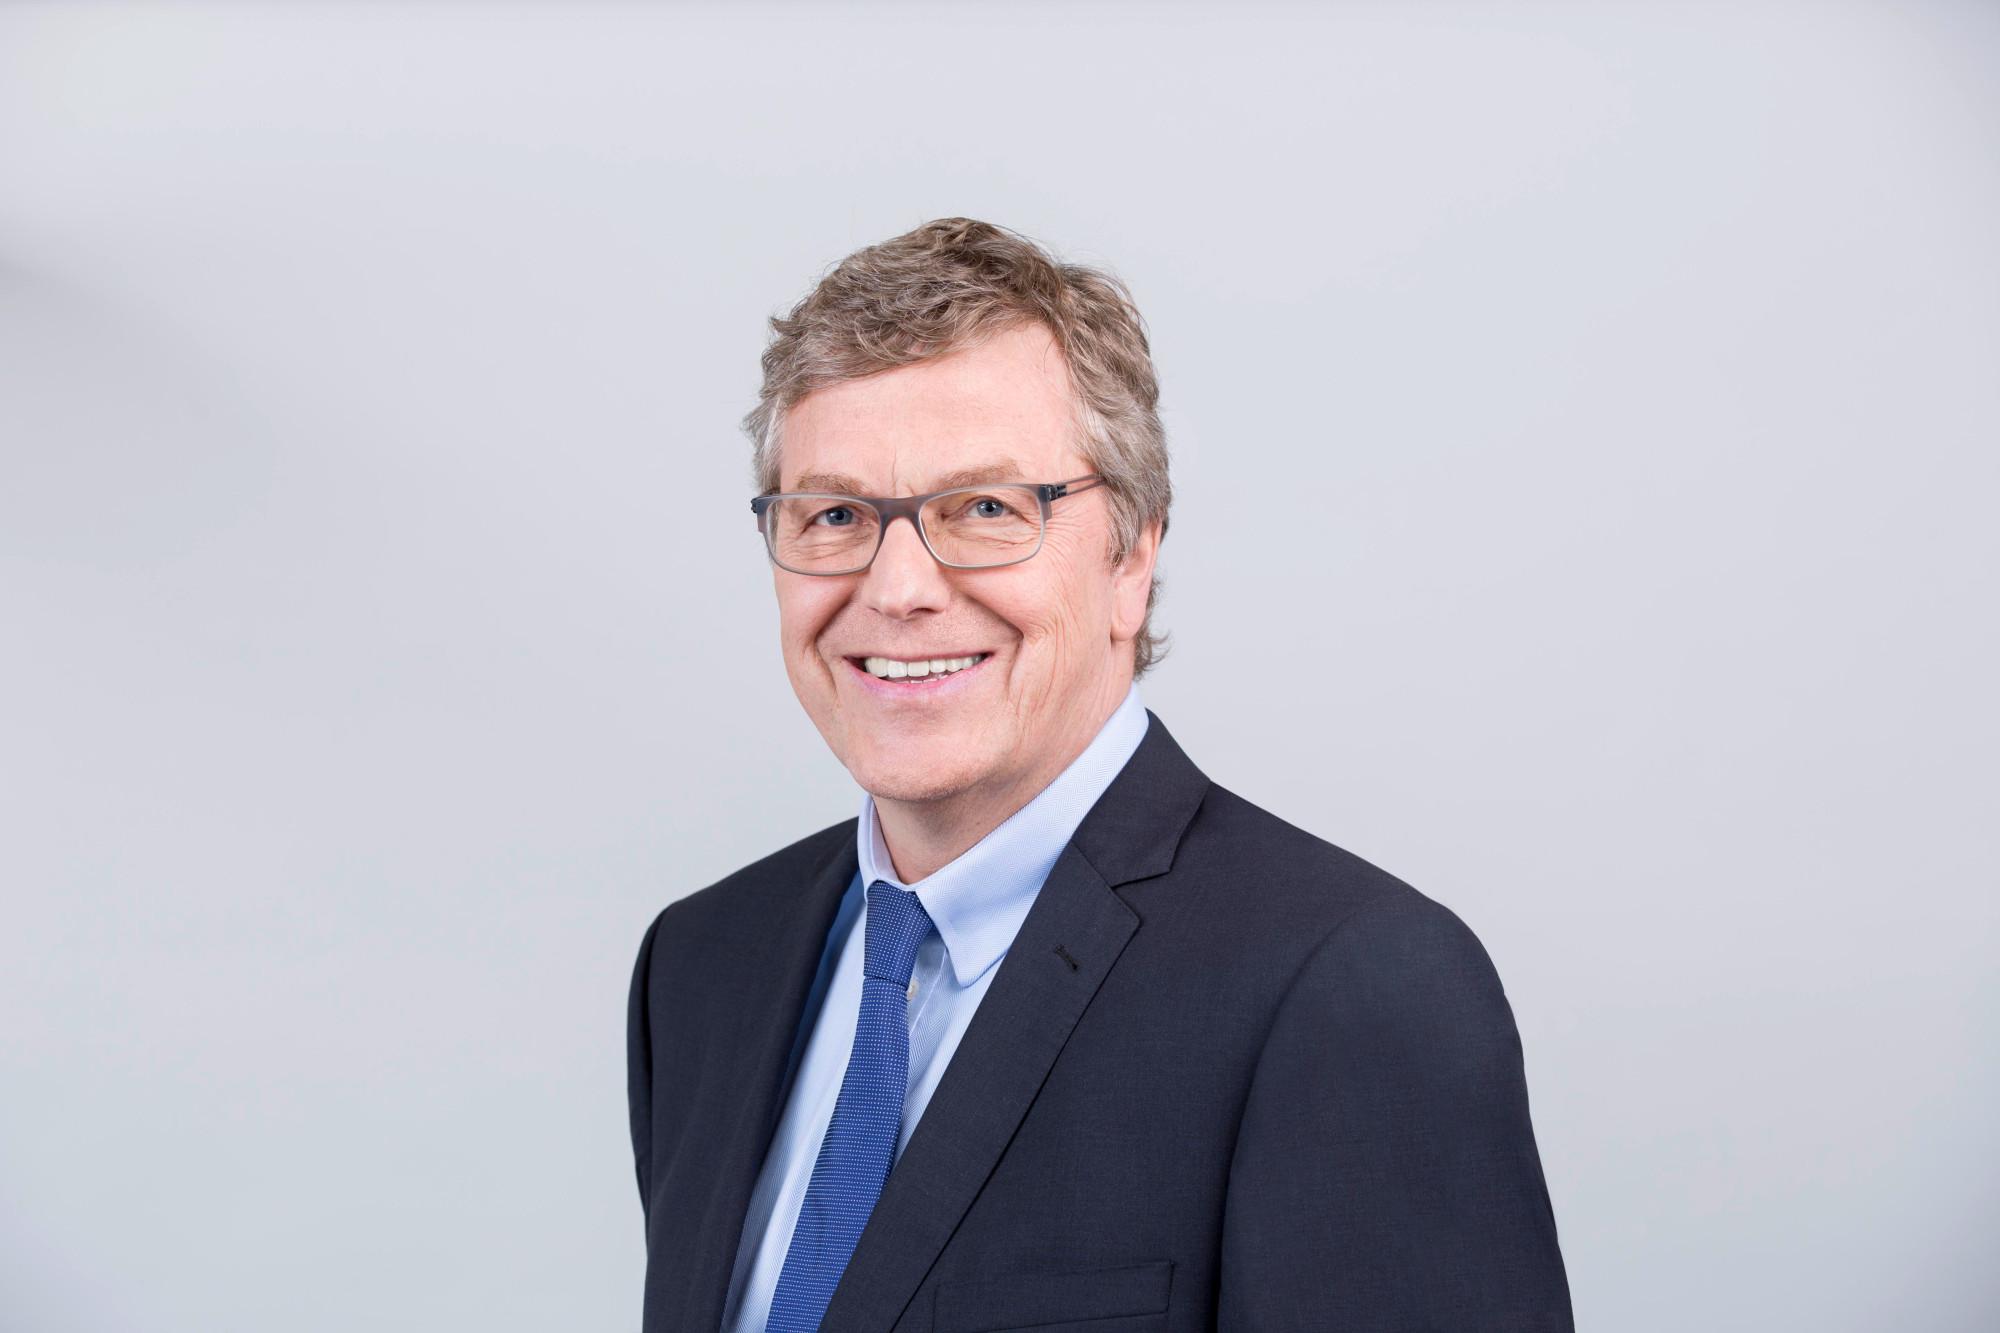 Erhard Wienkamp (Foto: Messe Düsseldorf/Constanze Tillmann)